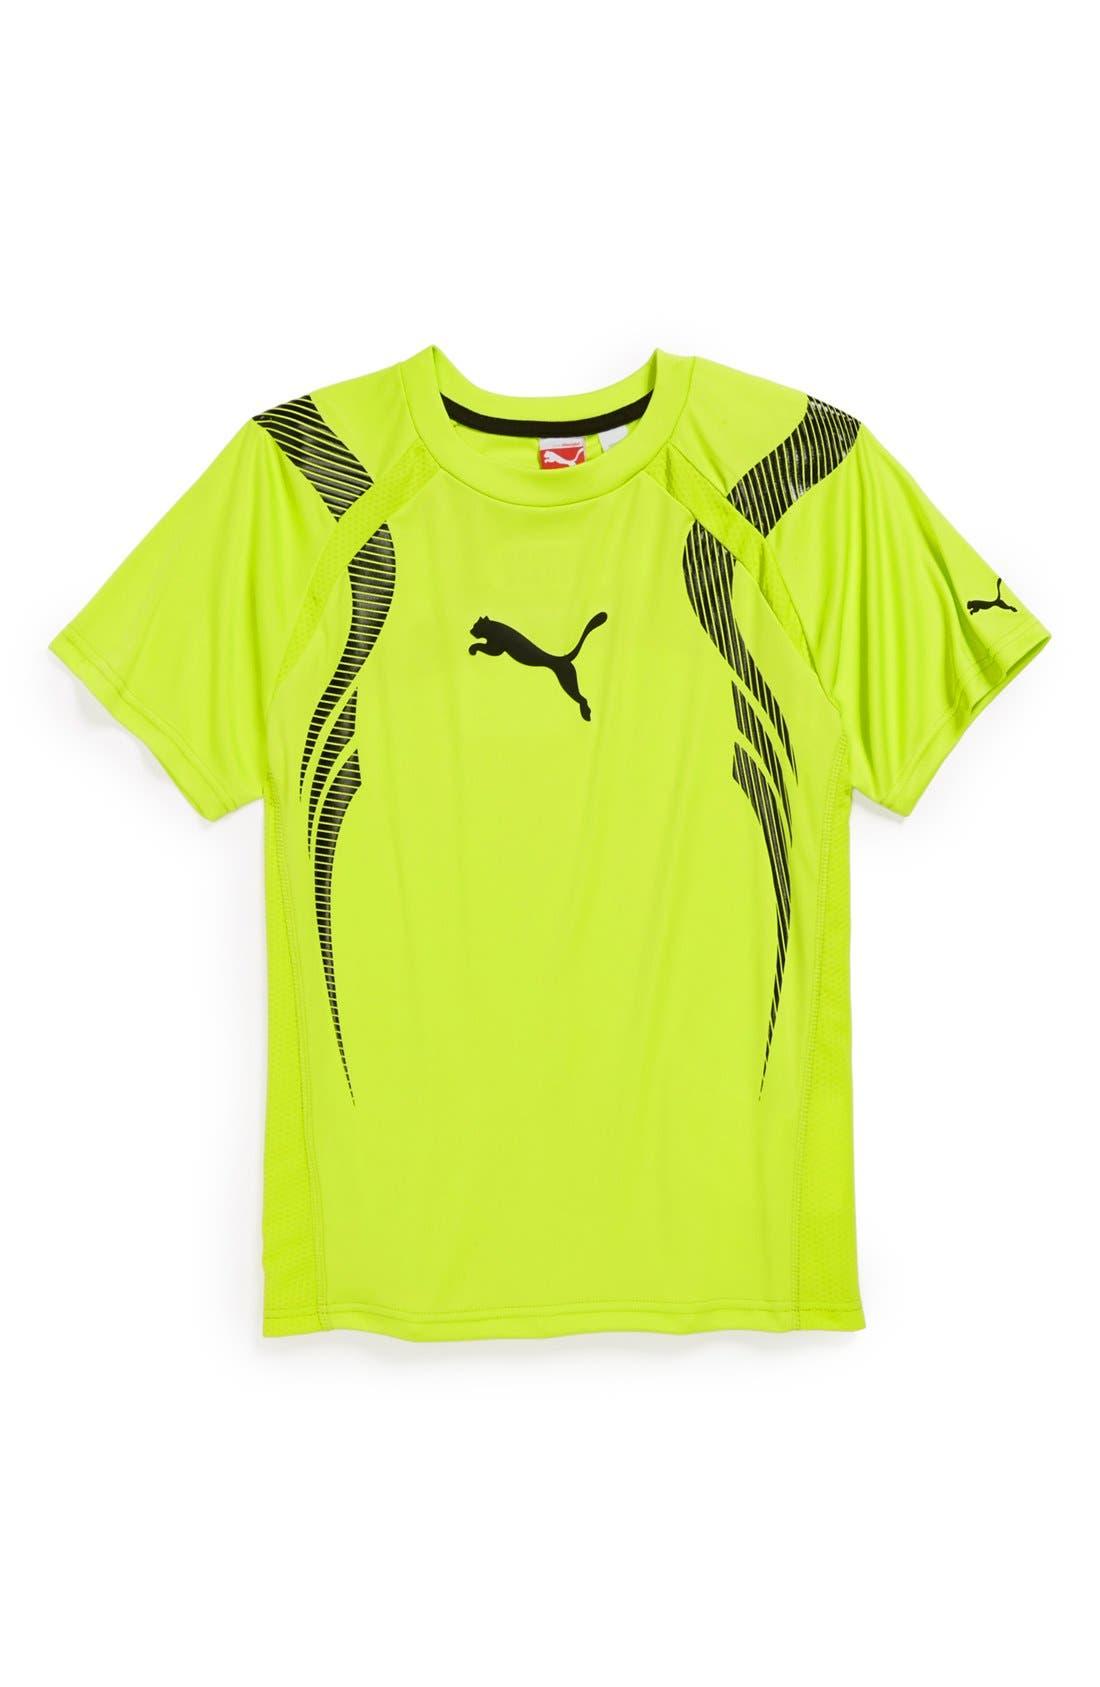 Alternate Image 1 Selected - PUMA 'Acceleration' Short Sleeve T-Shirt (Little Boys)